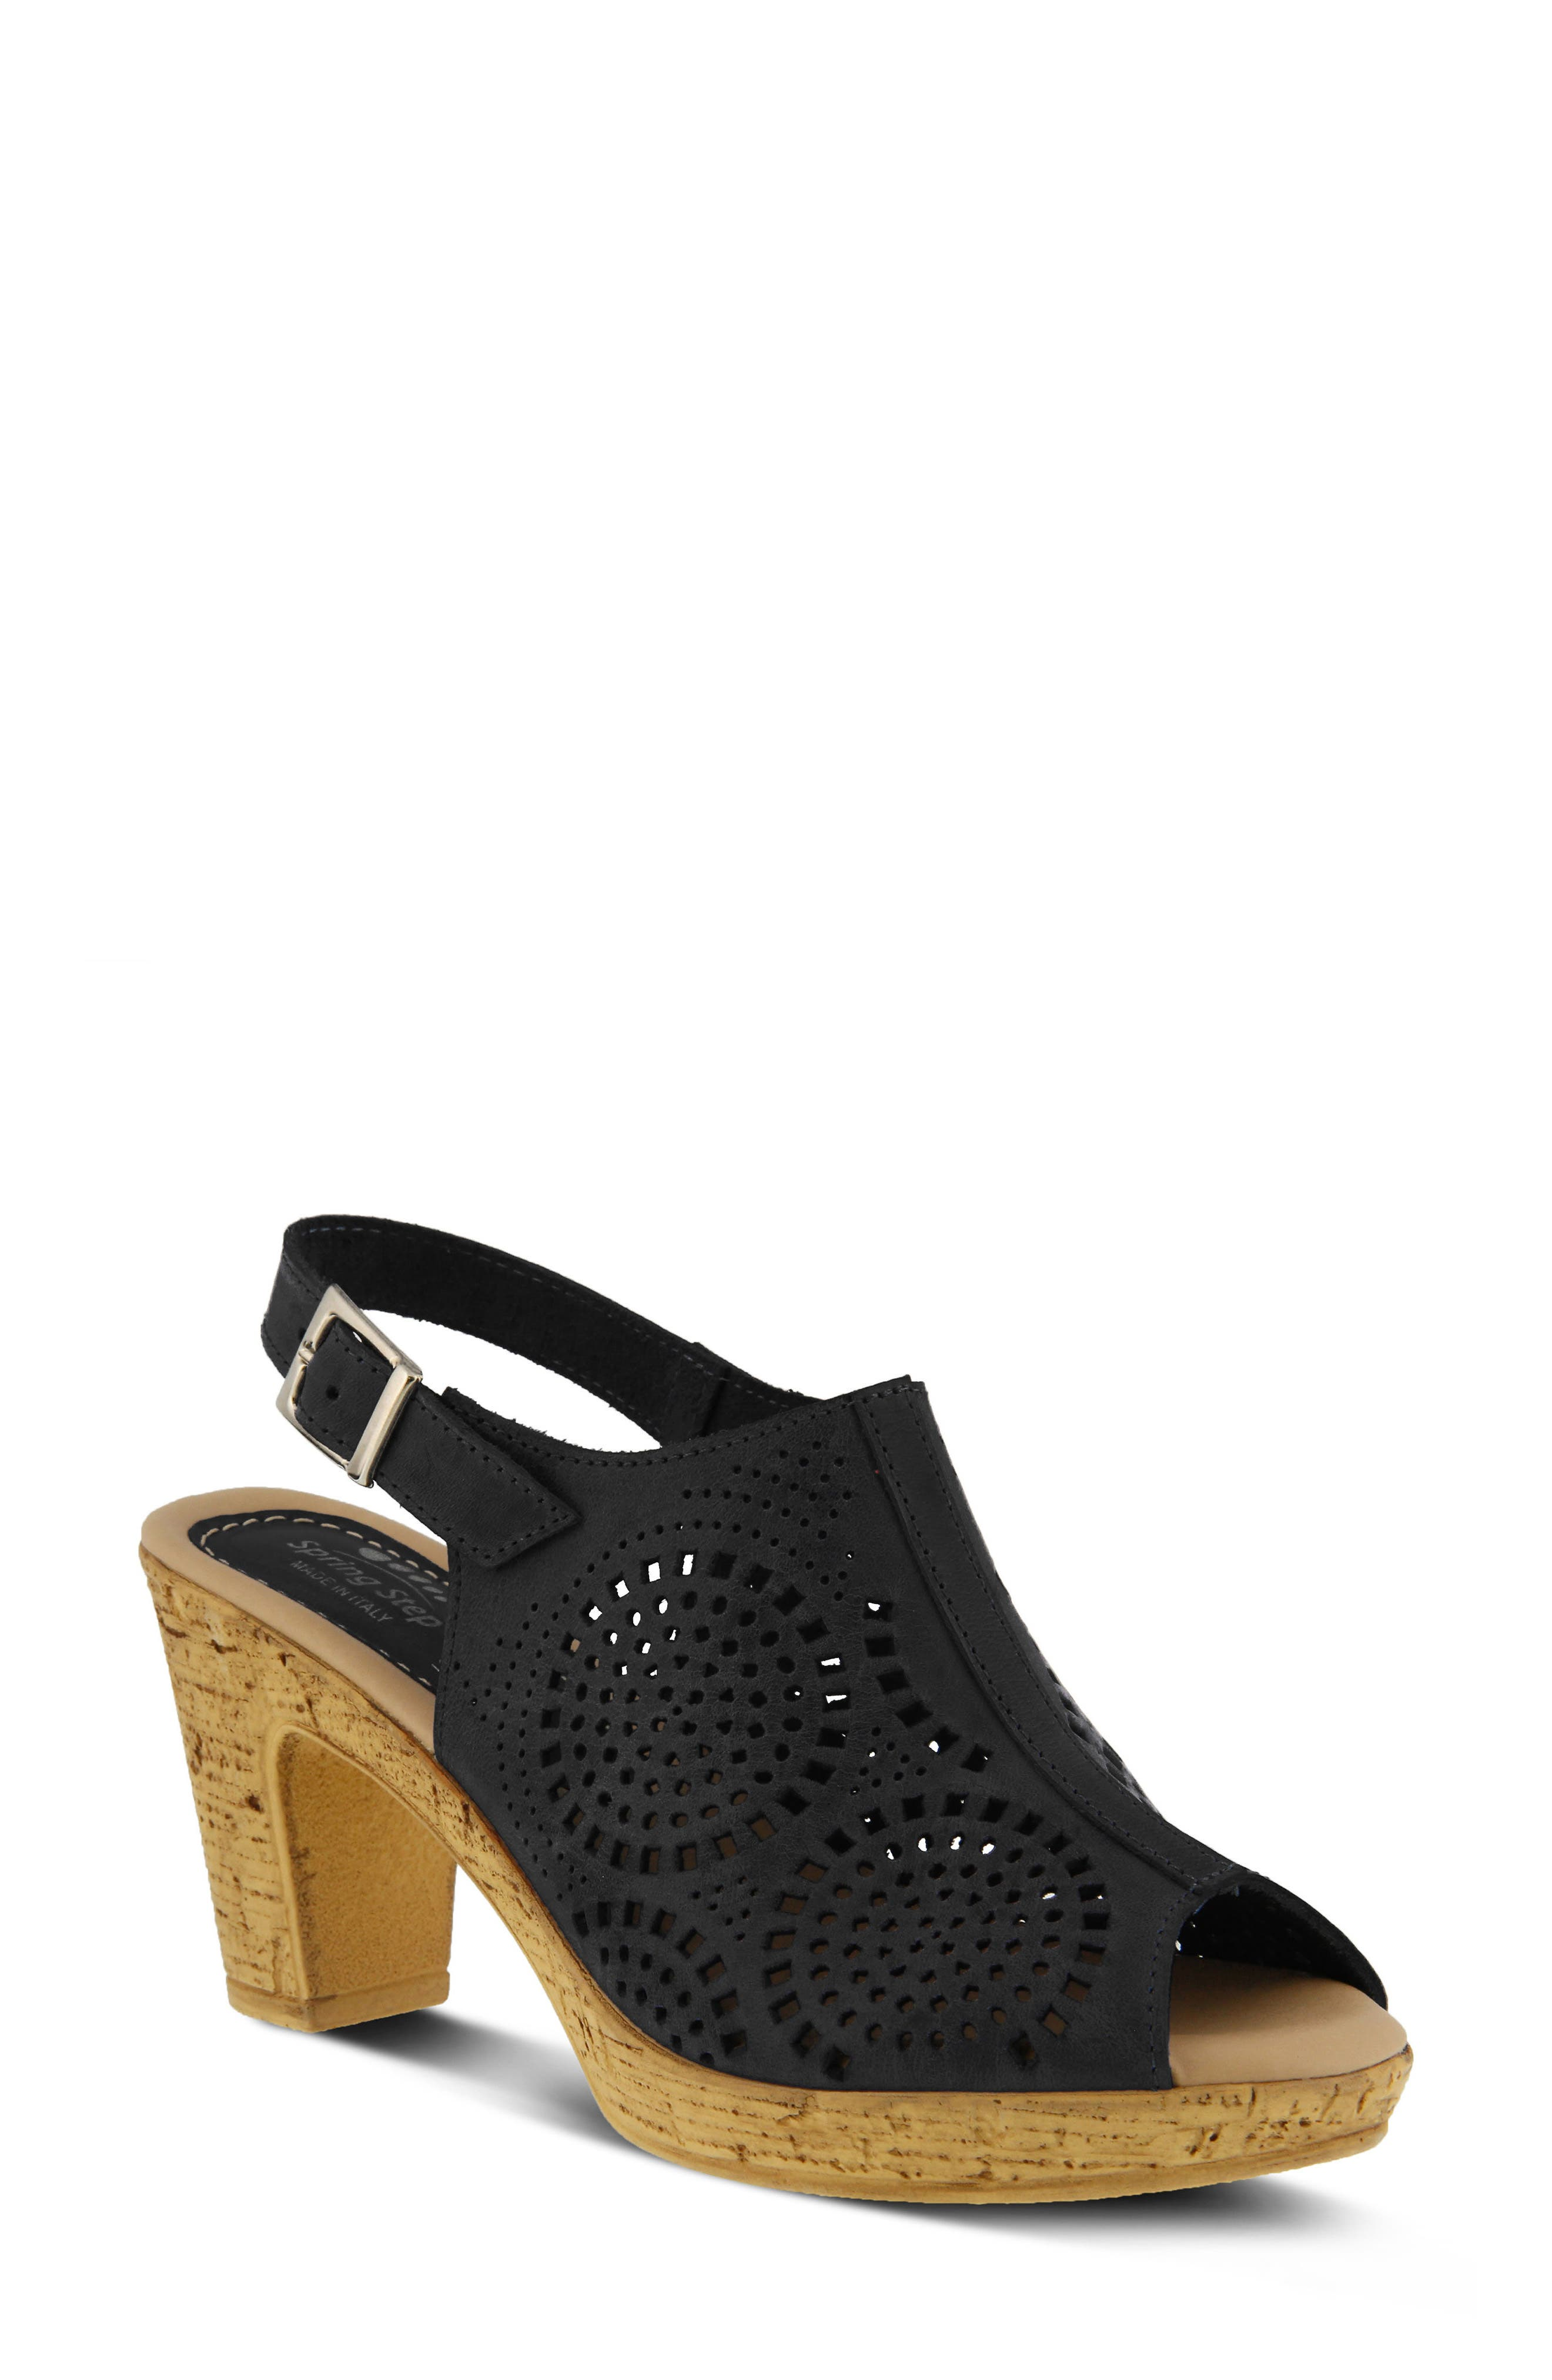 Liberty Platform Sandal,                         Main,                         color, Black Leather